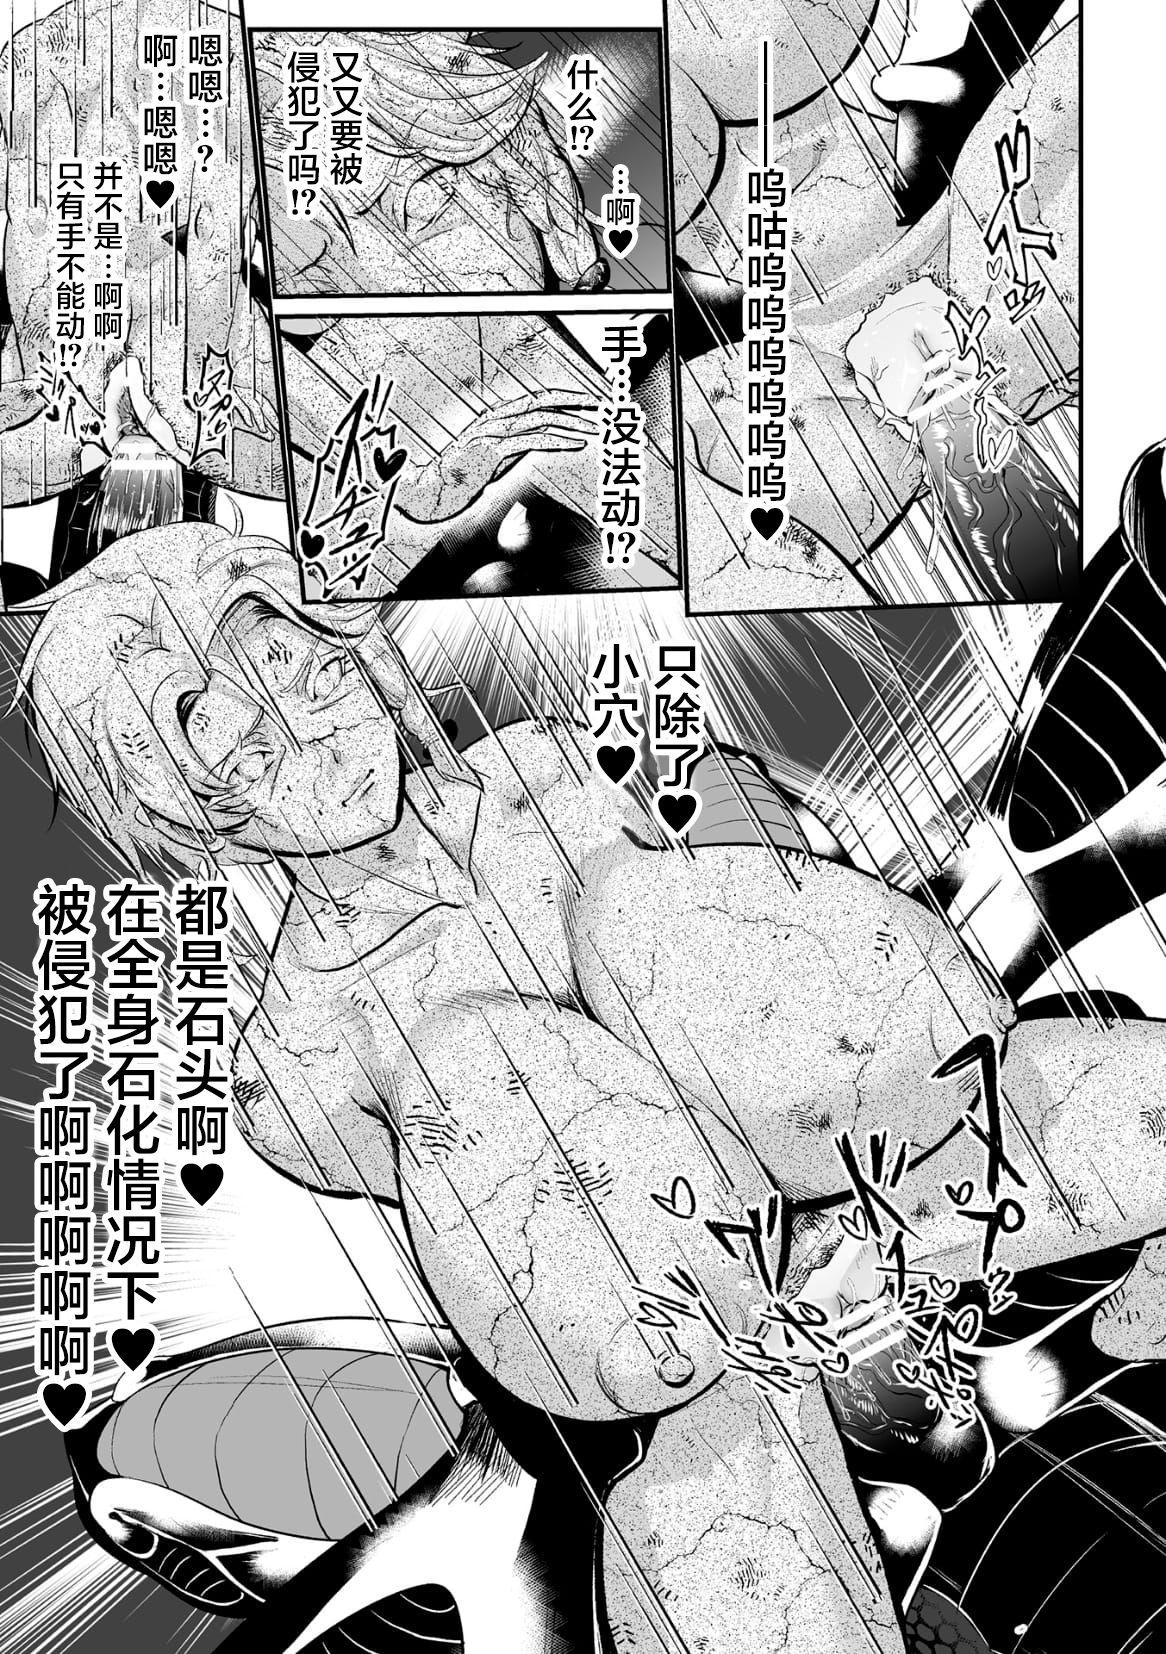 [Mou] Sekkan Fuuin ~Enbi na Sekizou ni Otosareshi Yuusha Ichizoku~ Ch. 1 [Chinese] [不咕鸟汉化组] 18